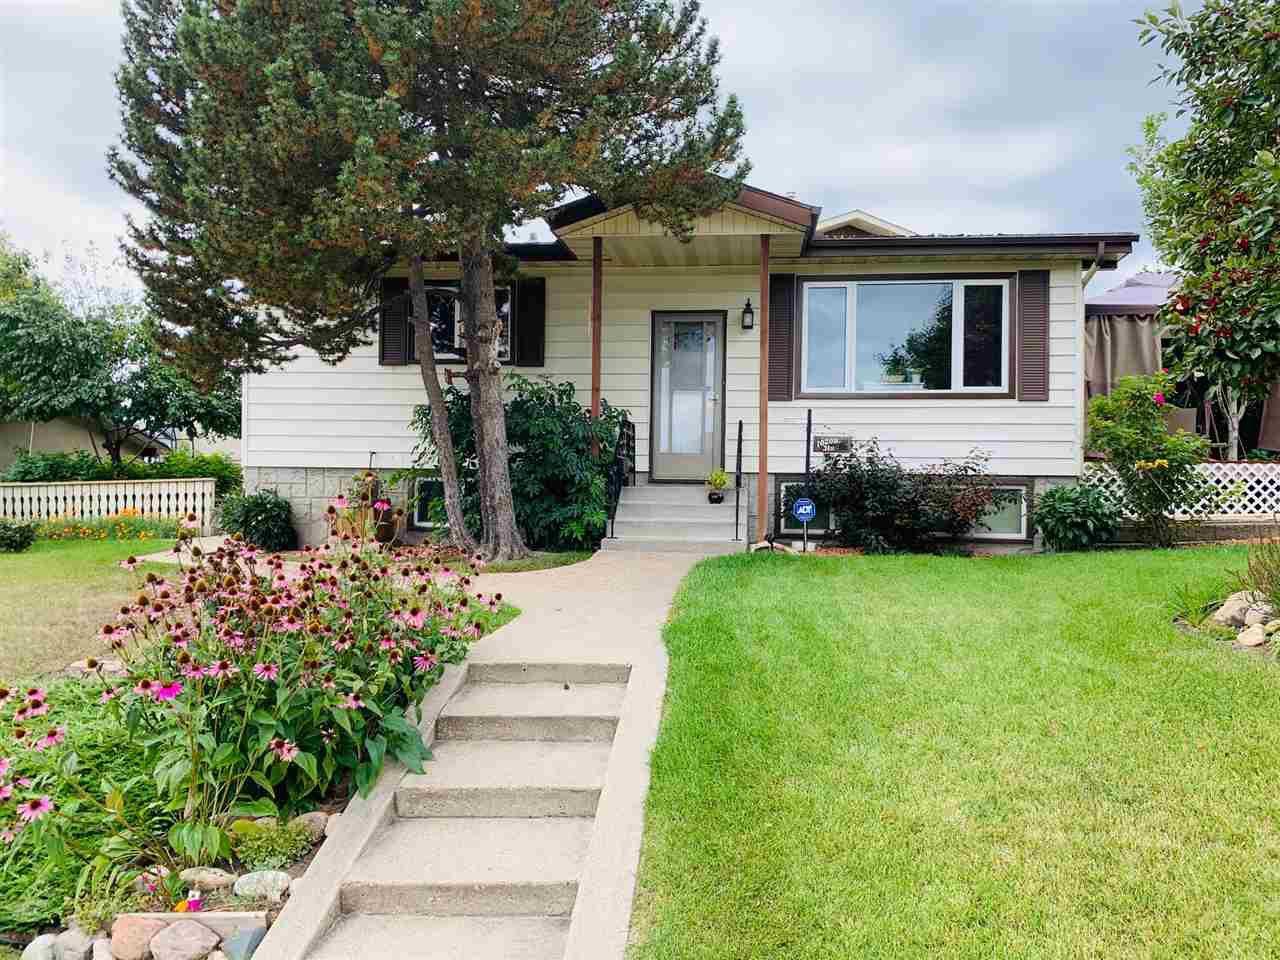 Main Photo: 10208 31 Street in Edmonton: Zone 23 House for sale : MLS®# E4172838